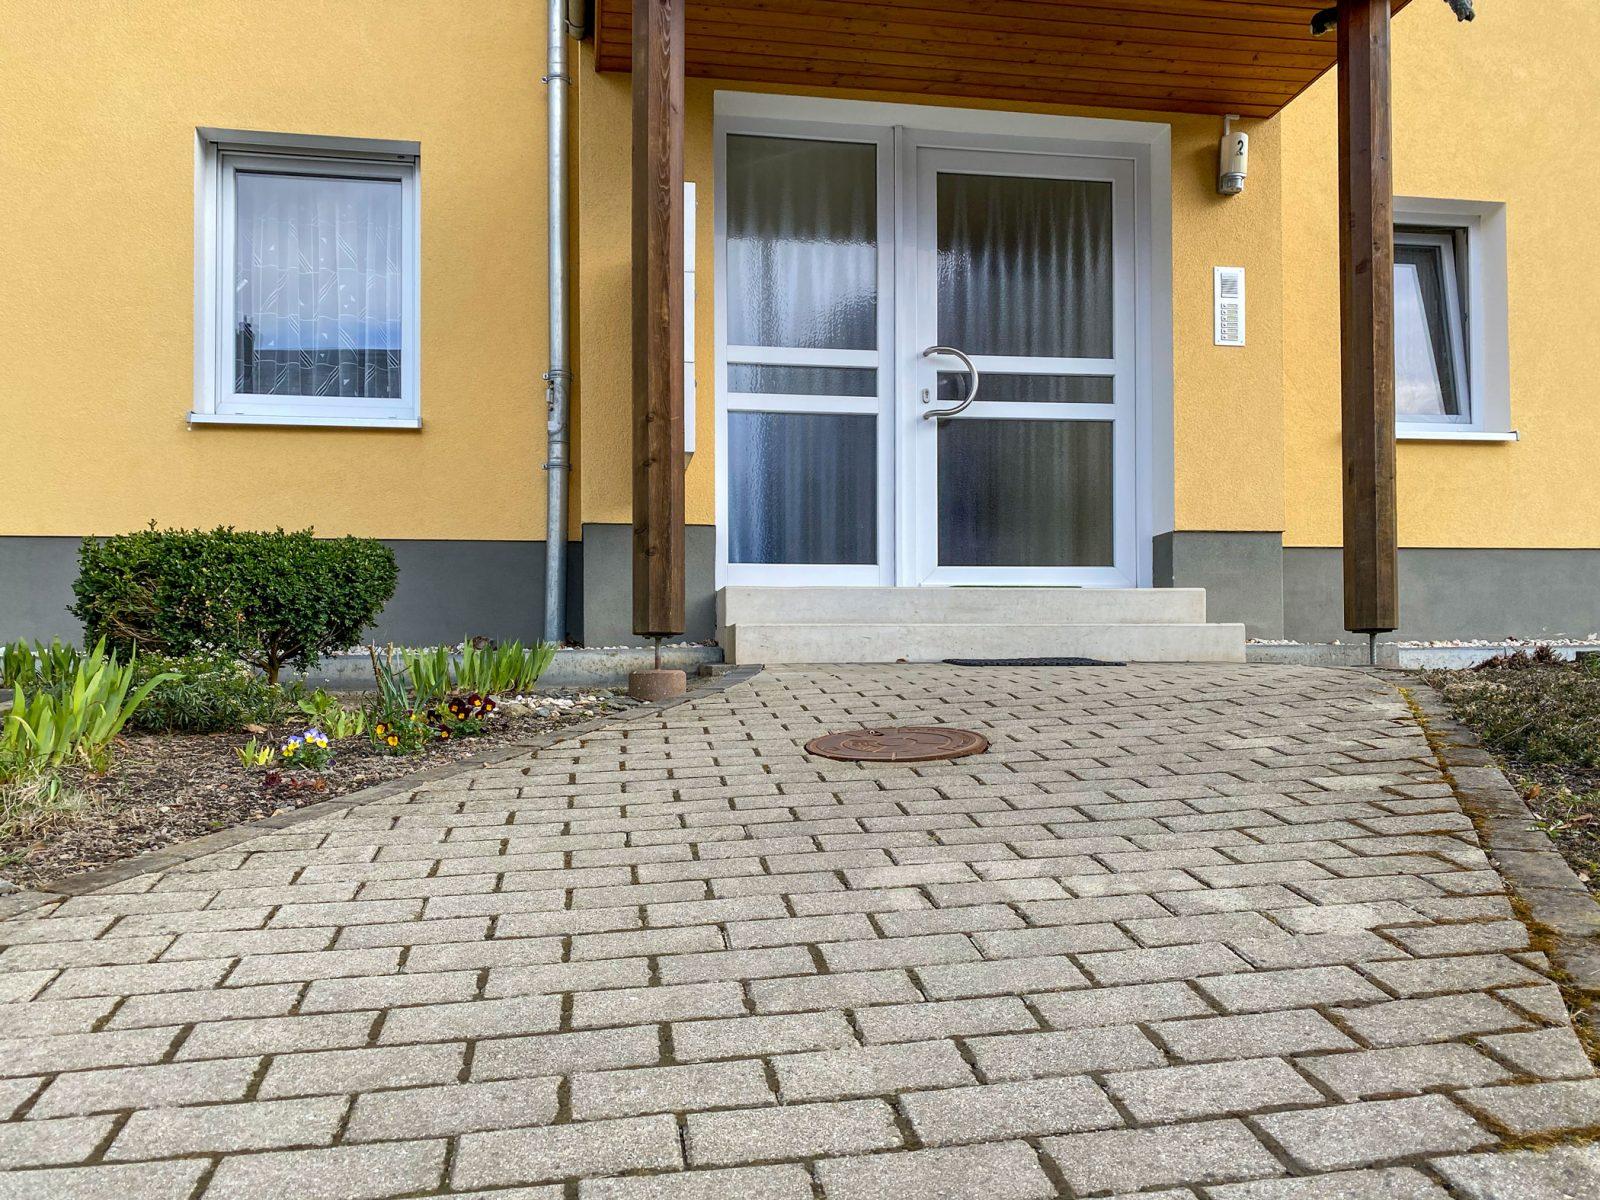 MFH-ZR-Betonpflaster-Mehrfamilienhaus-ETA_0296